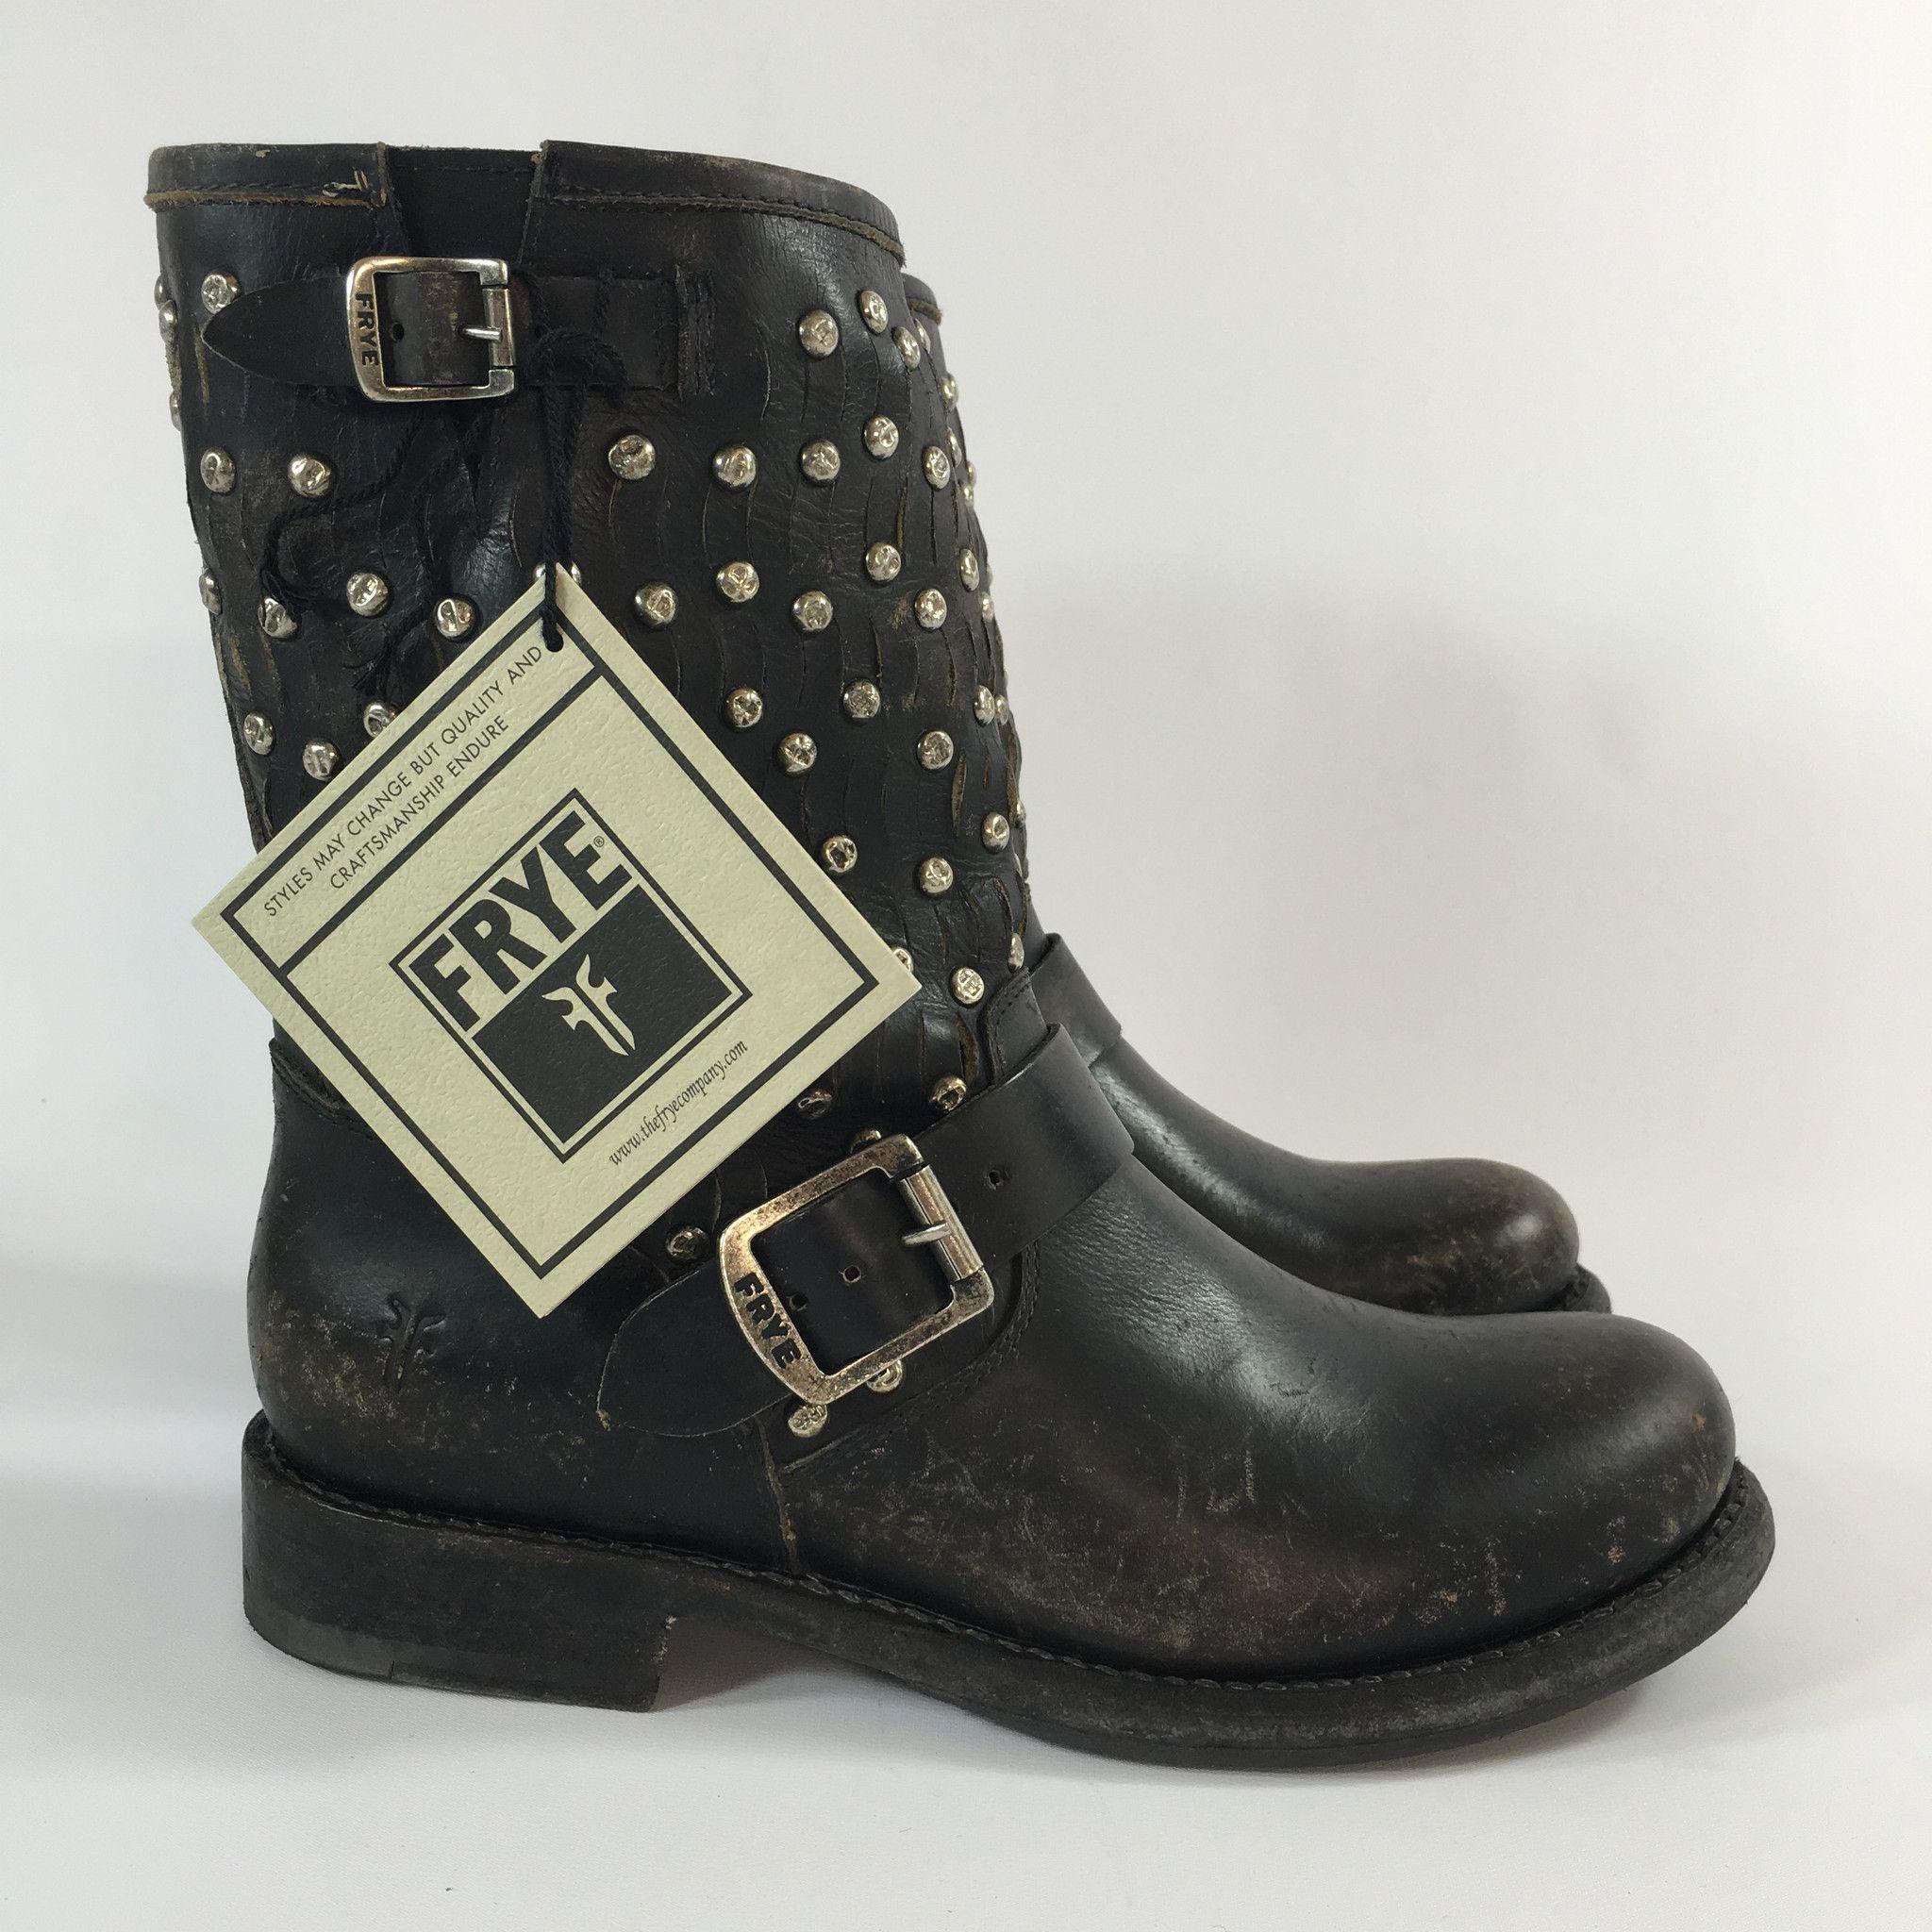 4c5949453915 Frye Jenna Cut Stud Short Ankle Boot Black Size 8